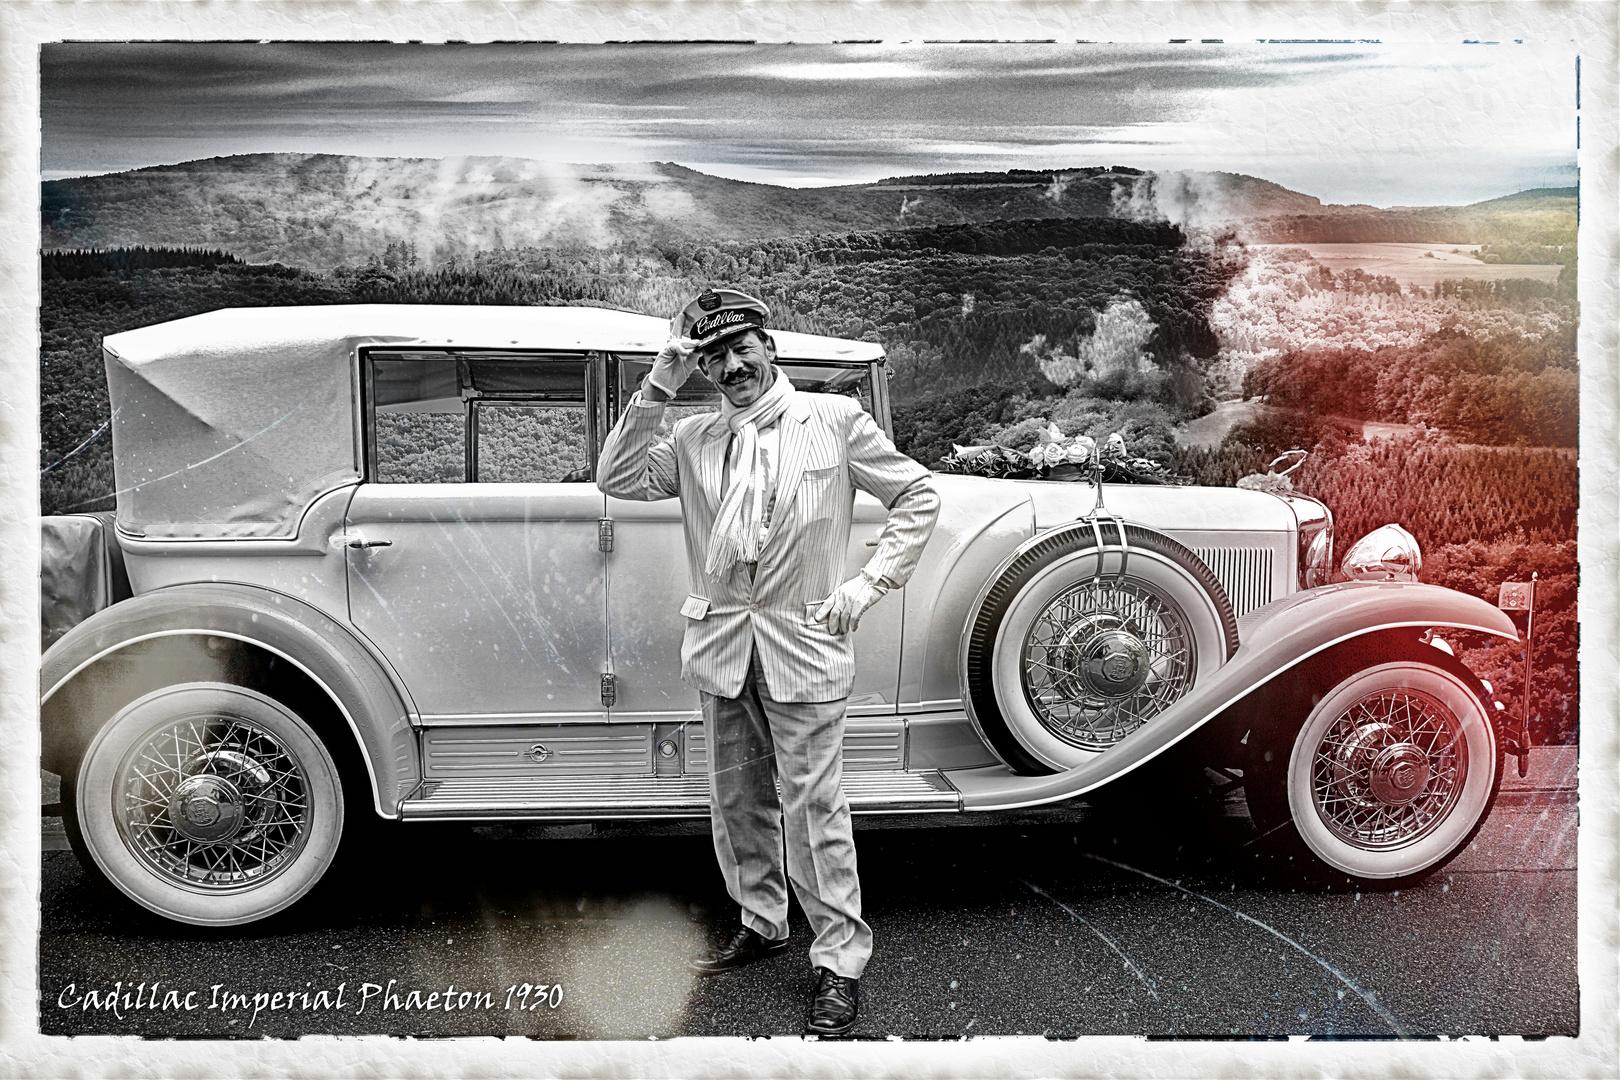 CAdillac Imperial Phaeton 1930